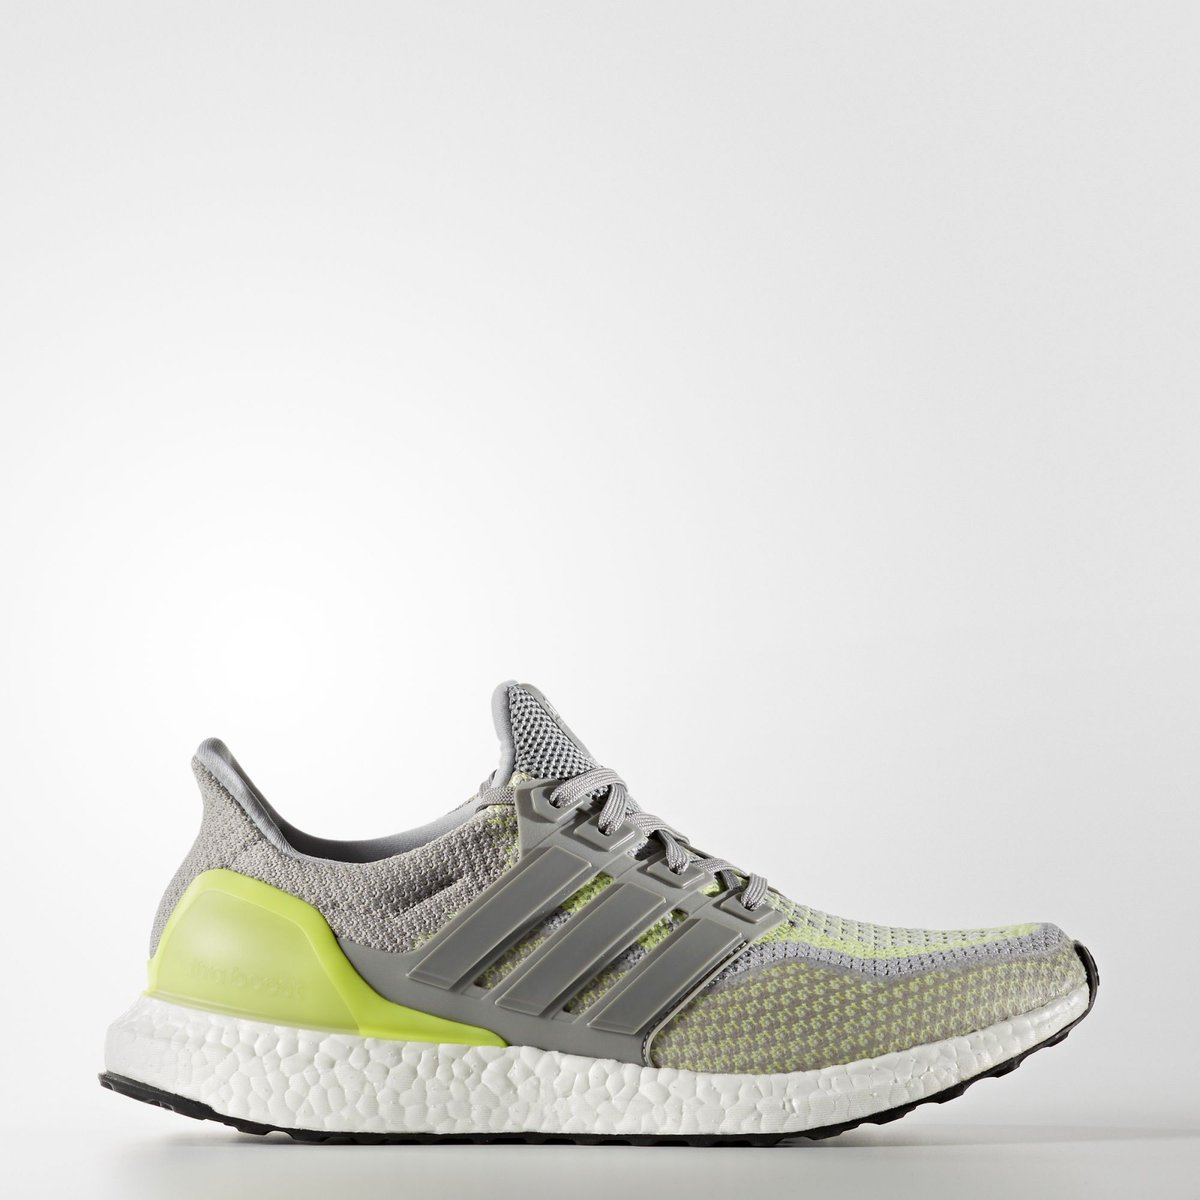 Ultra Boost ATR Ltd Shoes Charcoal Solid Grey   Charcoal Solid Grey    Electricity AKA GLOW IN THE DARKpic.twitter.com uxoC213AE0 d7ab74252